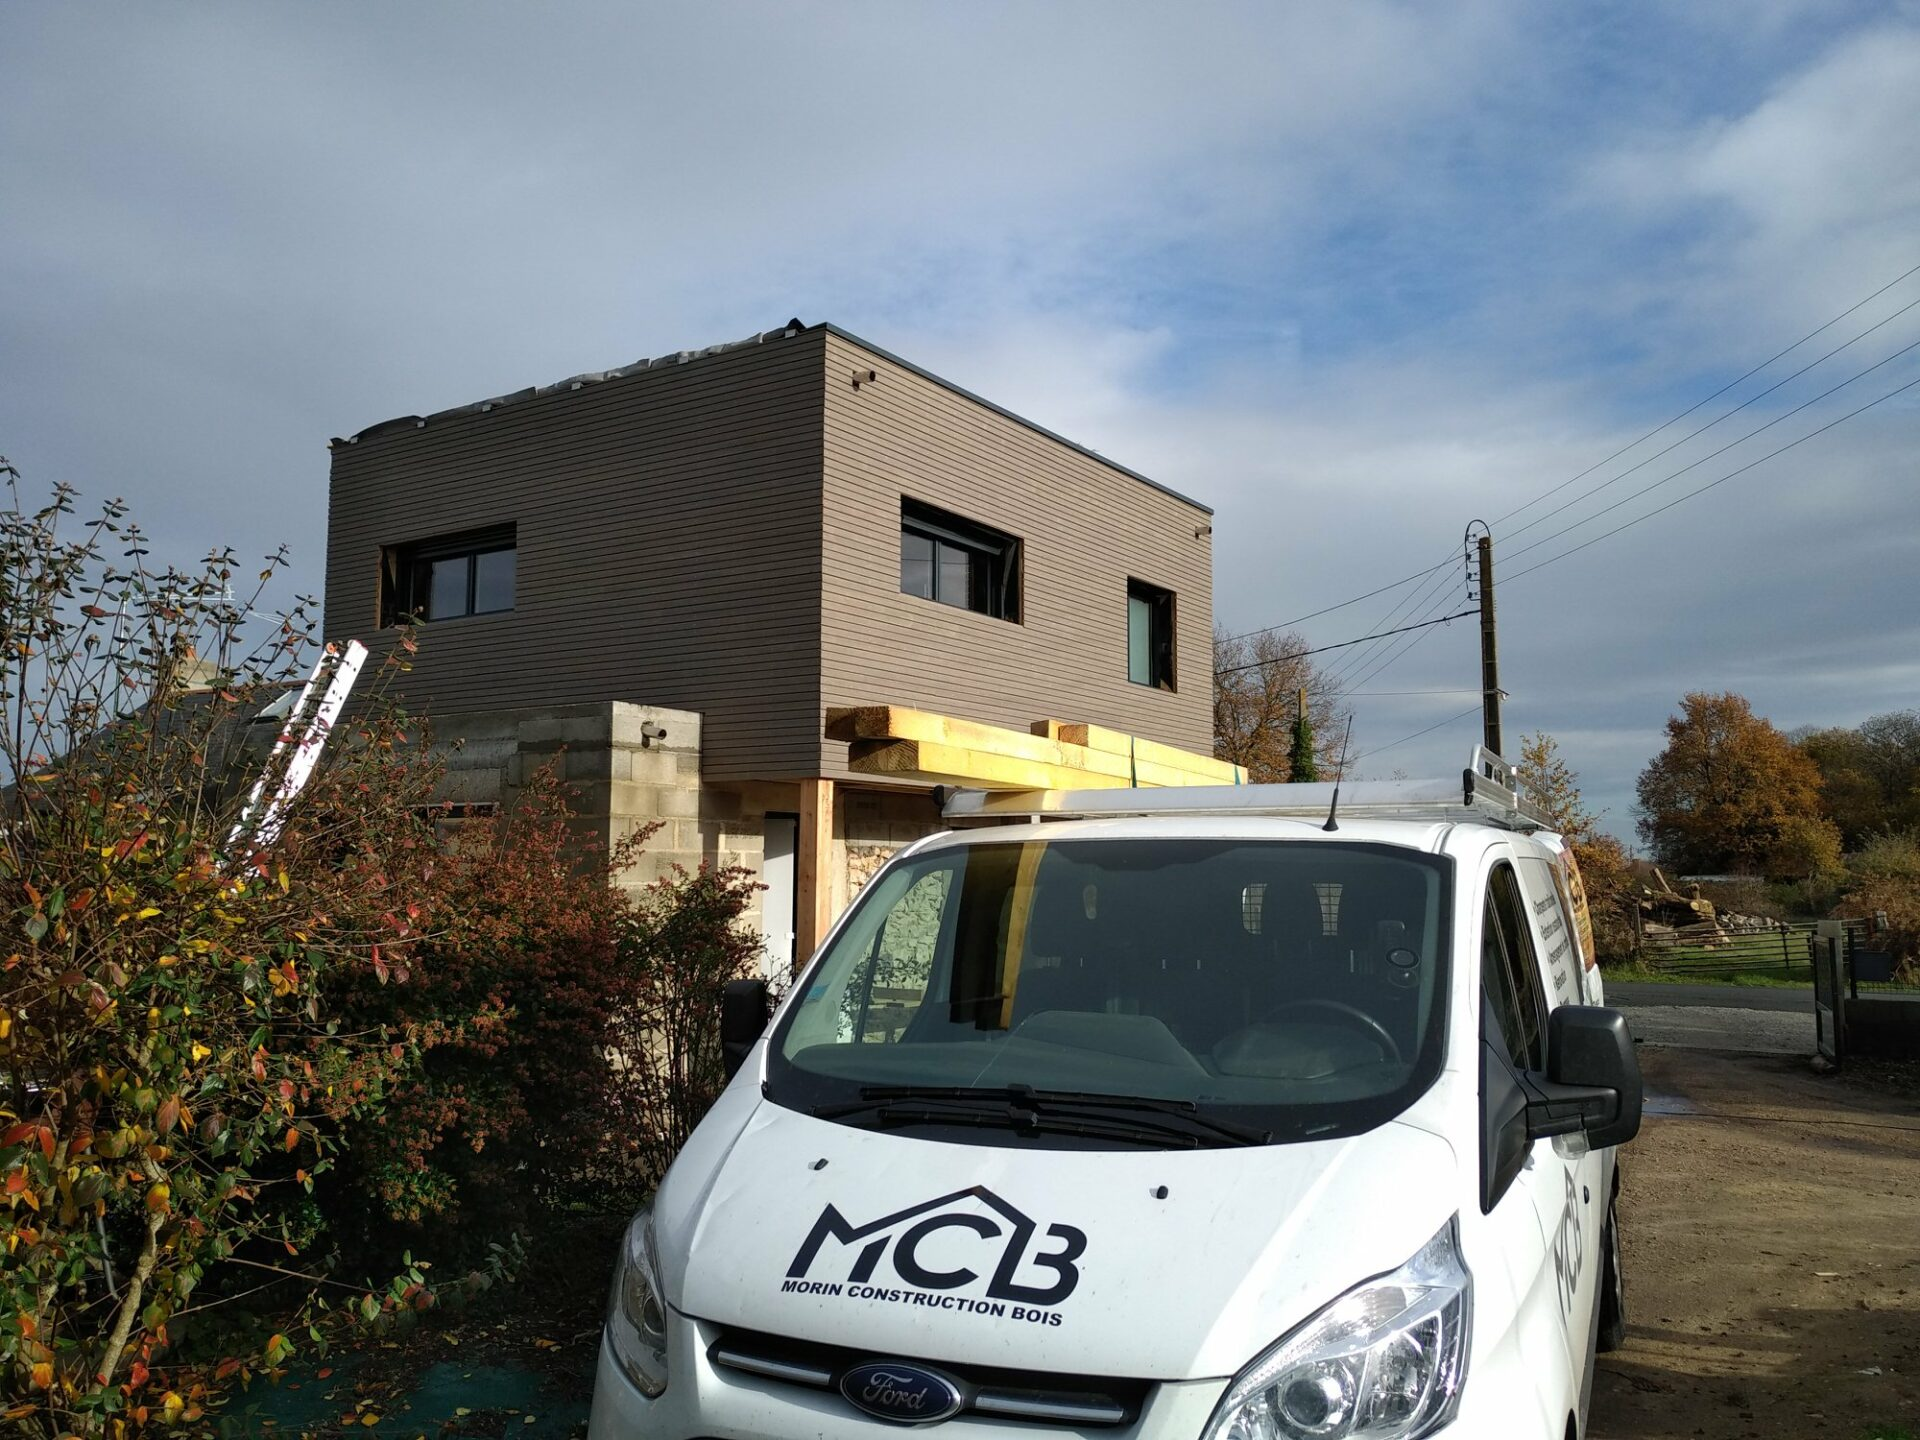 mcb-morin-construction-bois-tierce-bardage-bois-00